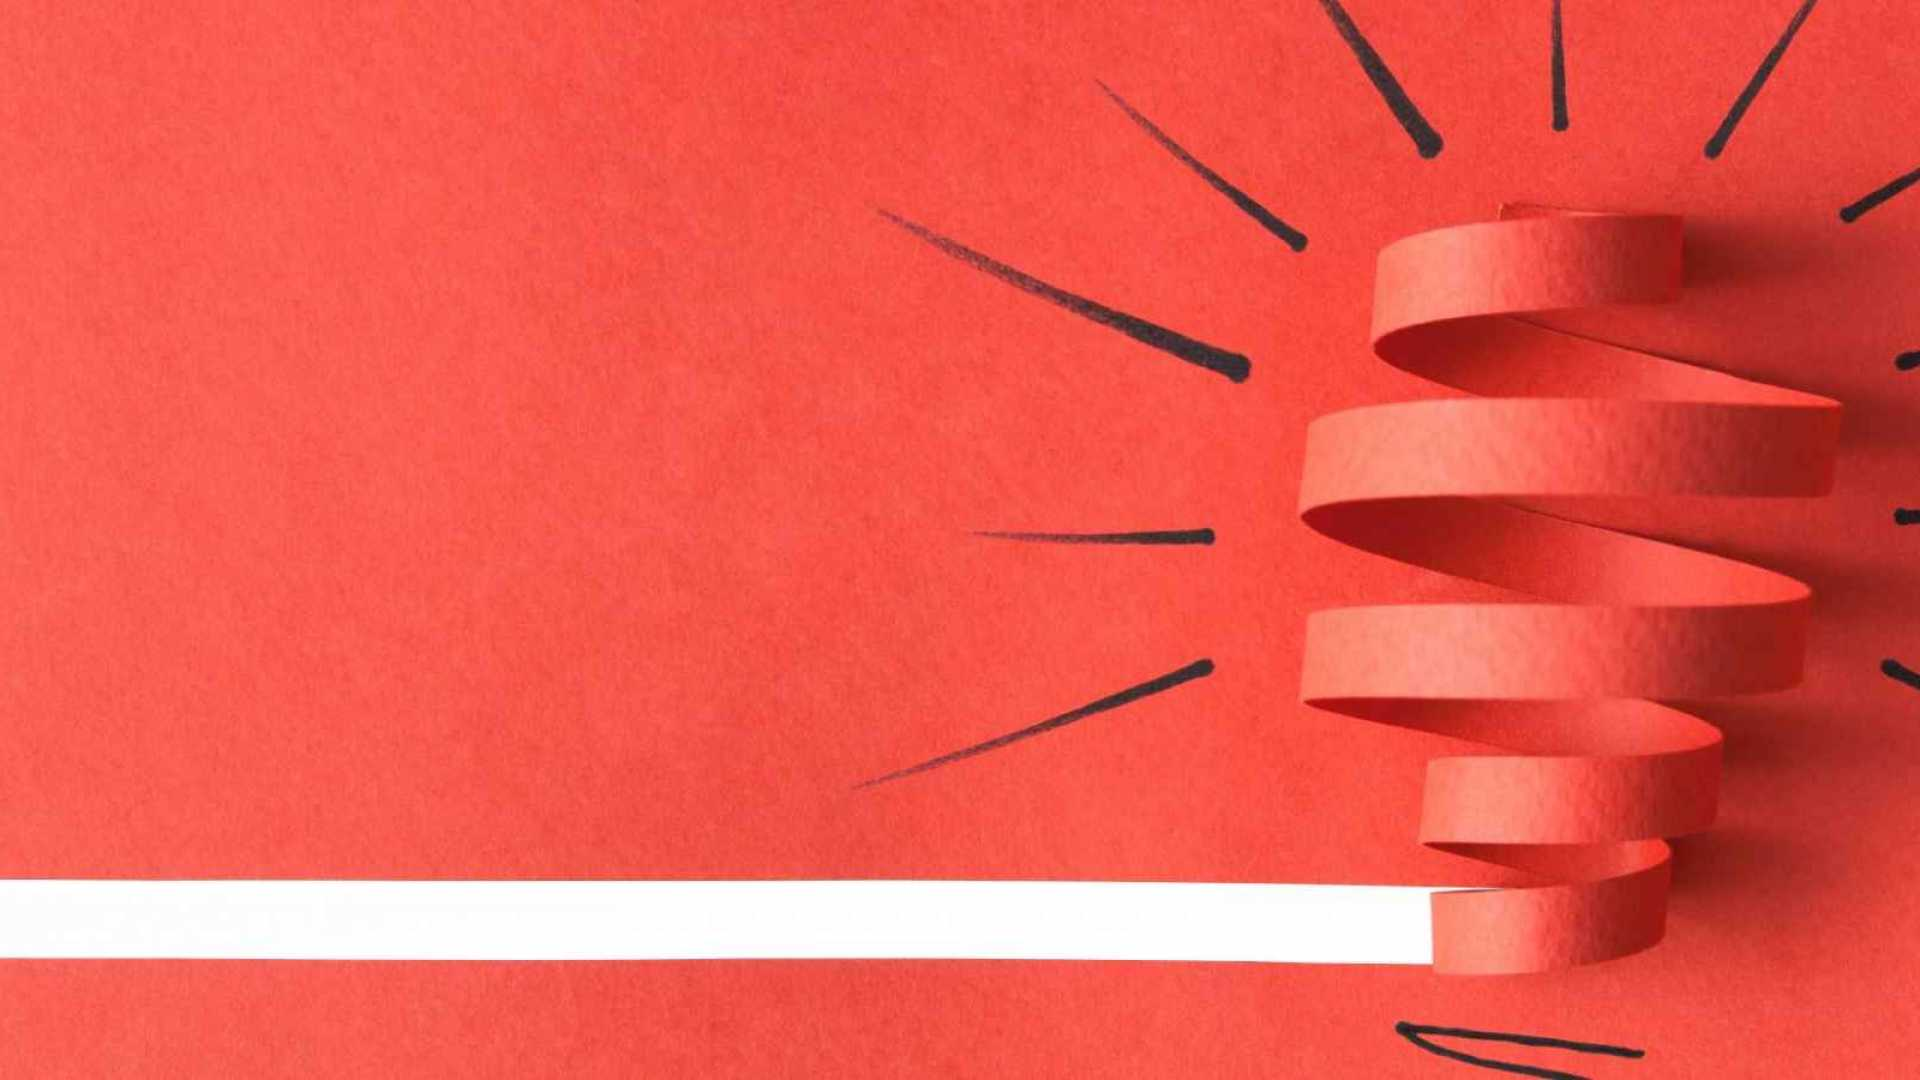 How PepsiCo's CMO Creates a Culture of Innovation